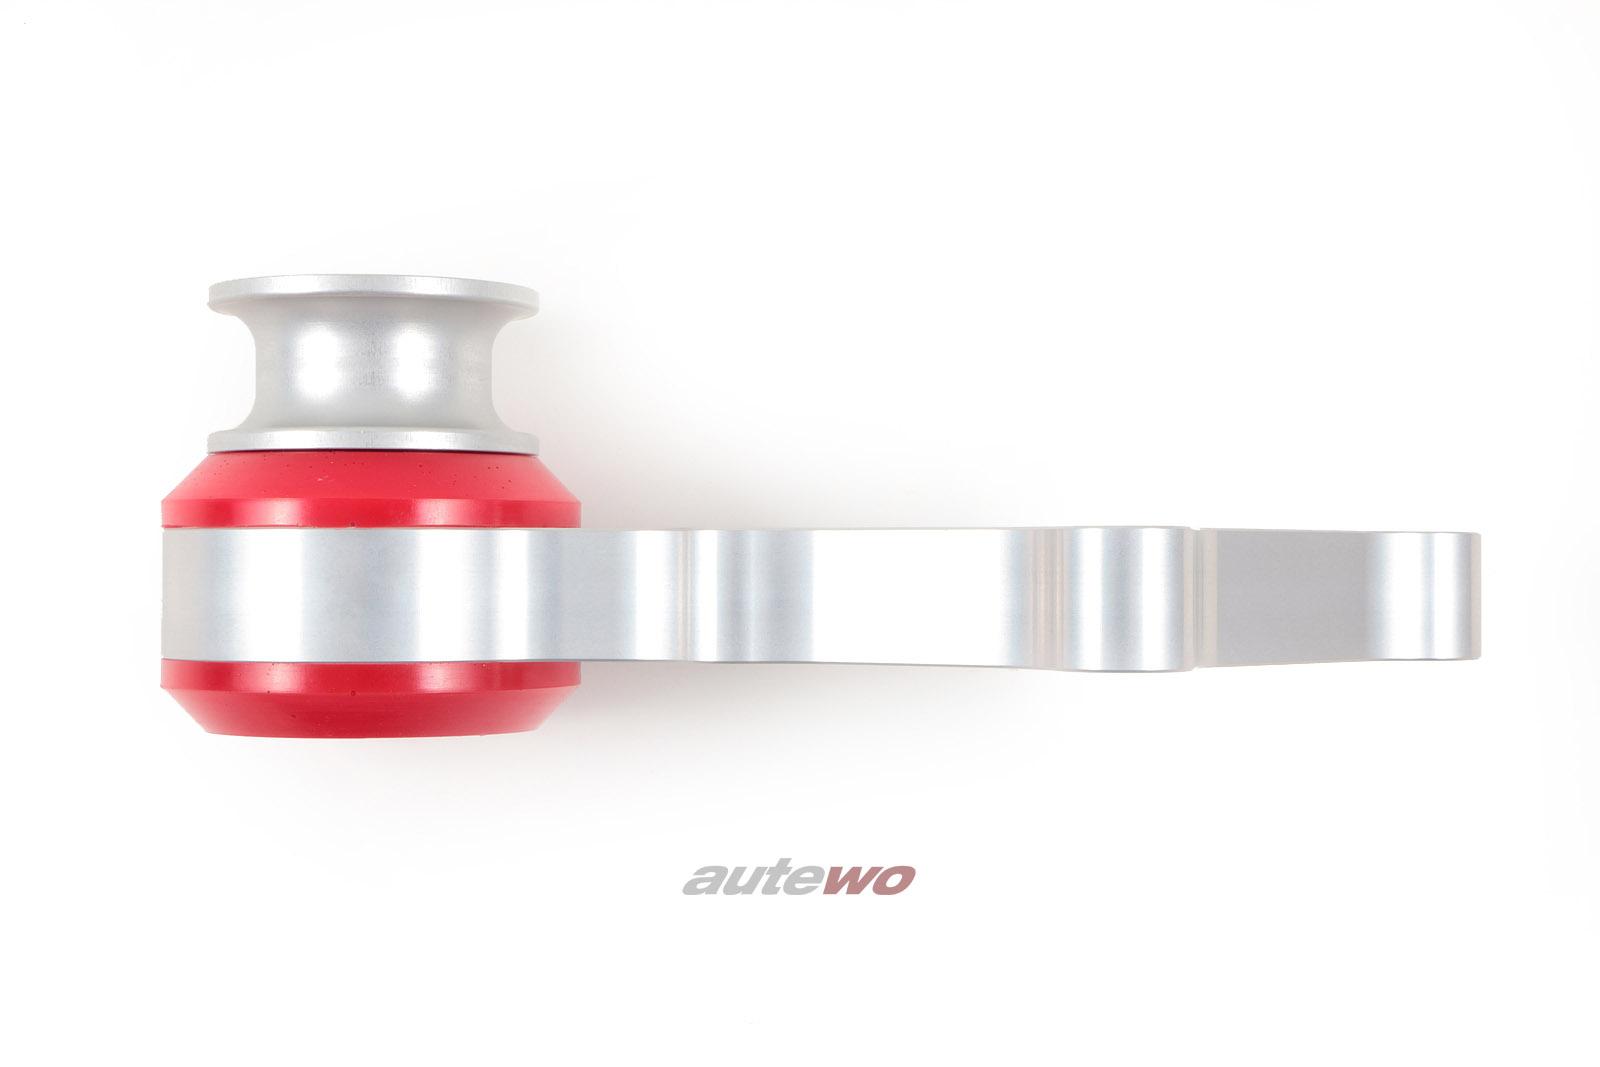 ak motorsport getriebest tze differential audi 80 b4 s2. Black Bedroom Furniture Sets. Home Design Ideas